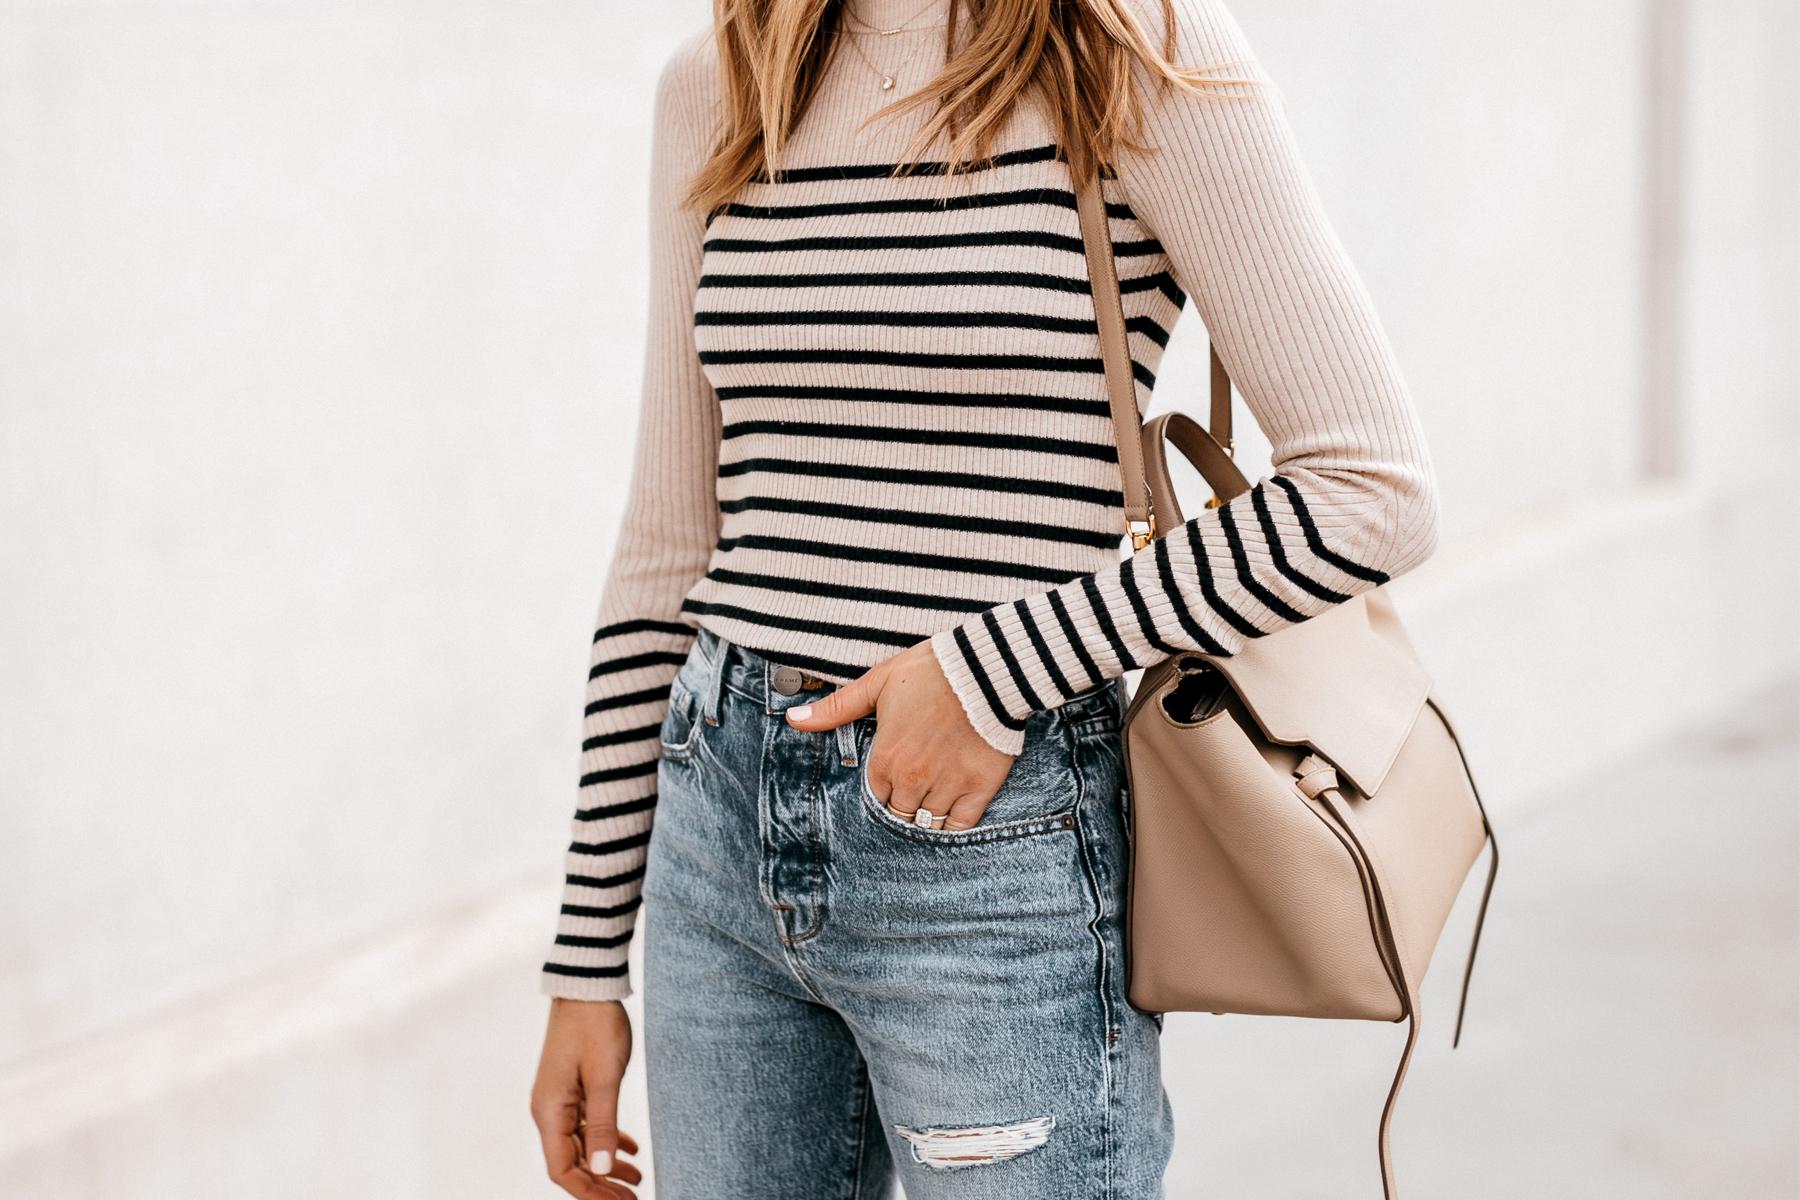 Fashion Jackson Wearing Rag and Bone Striped Long Sleeve Top Ripped Jeans Celine Belt Bag